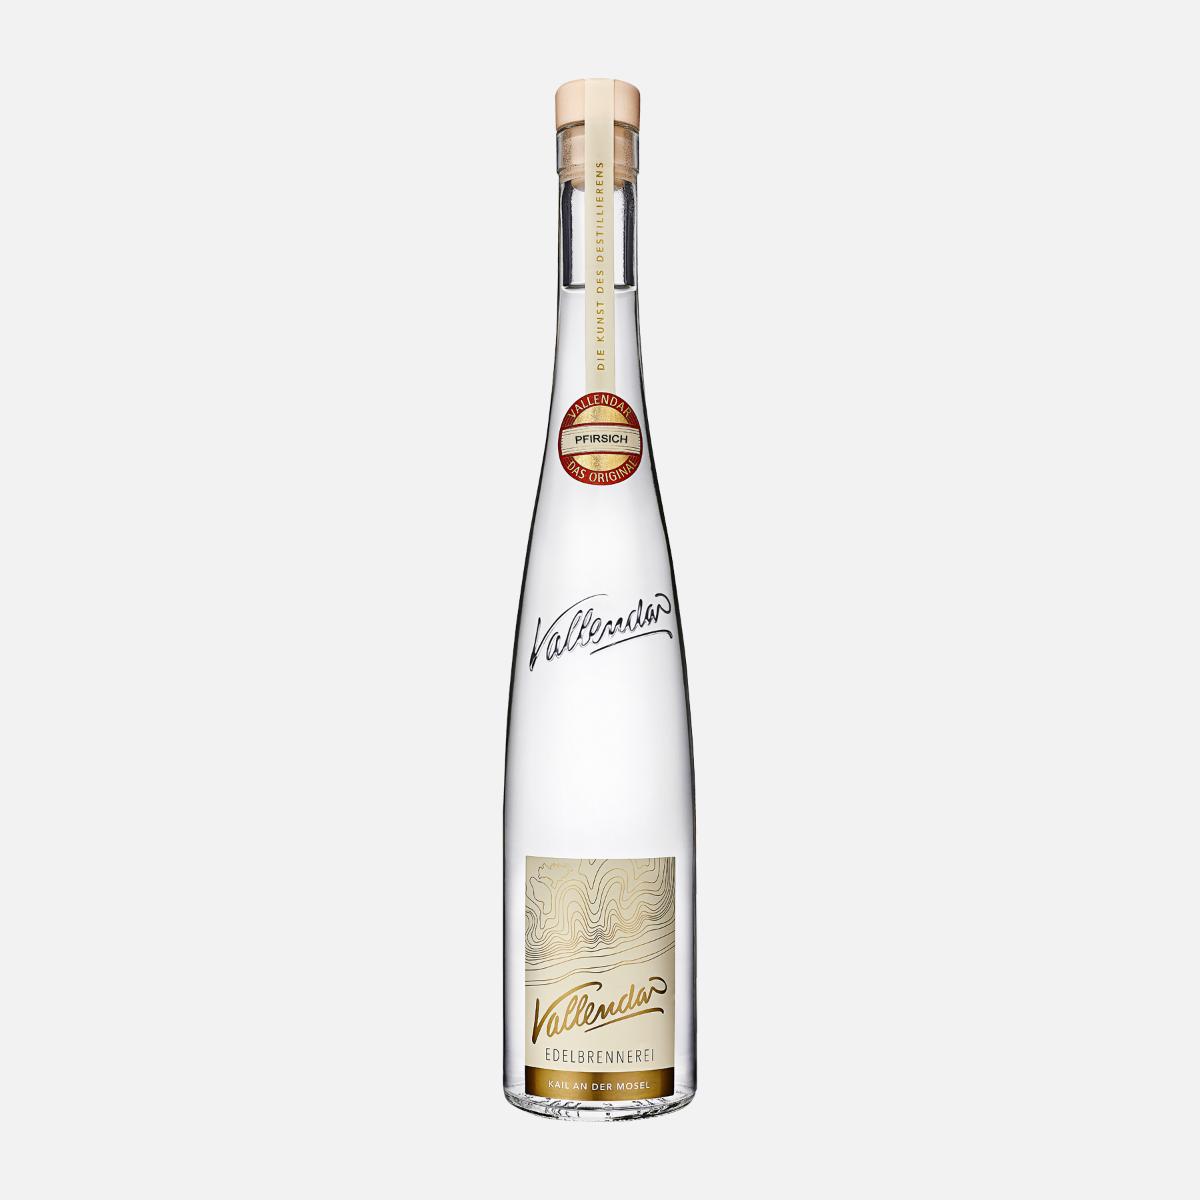 Vallendar Roter Weinbergpfirsichbrand 40% - 0,5l.